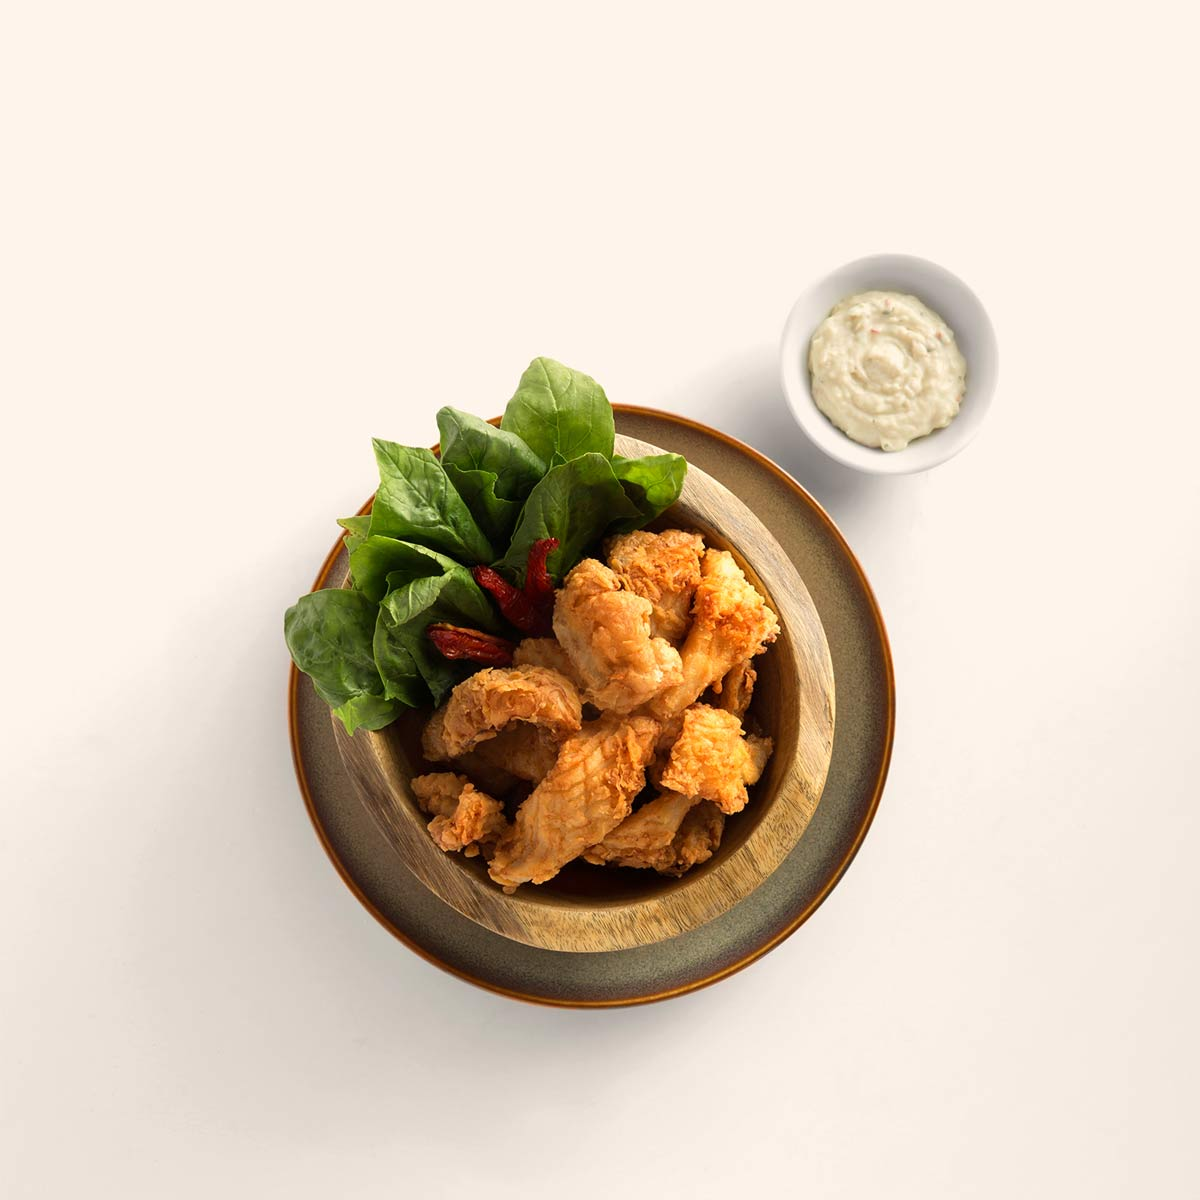 L'Usine - Eatery Deep fried calamari